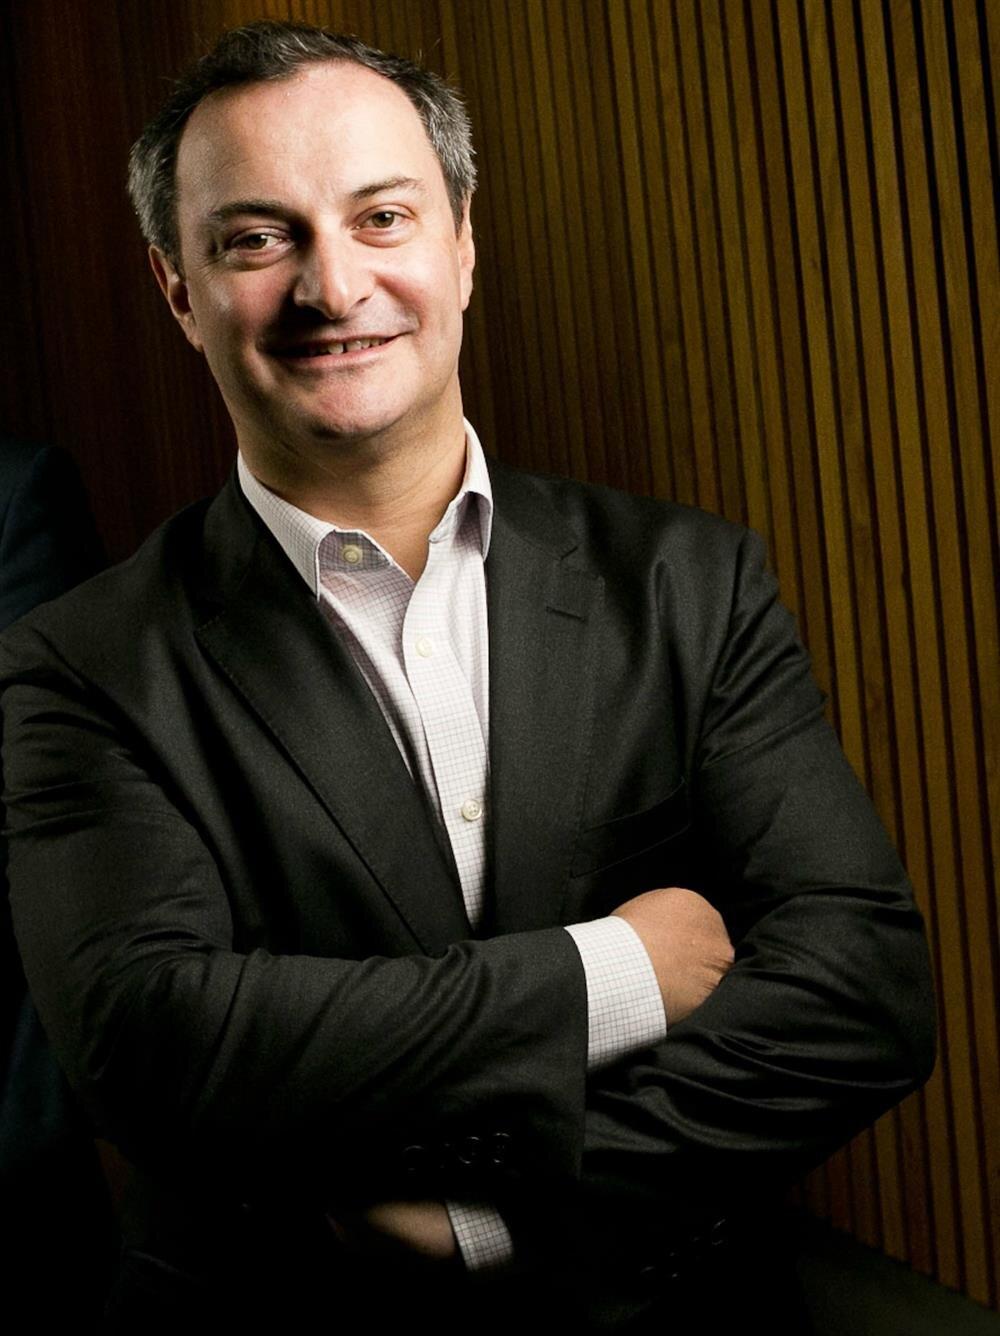 Dr. Jonathan Reichental